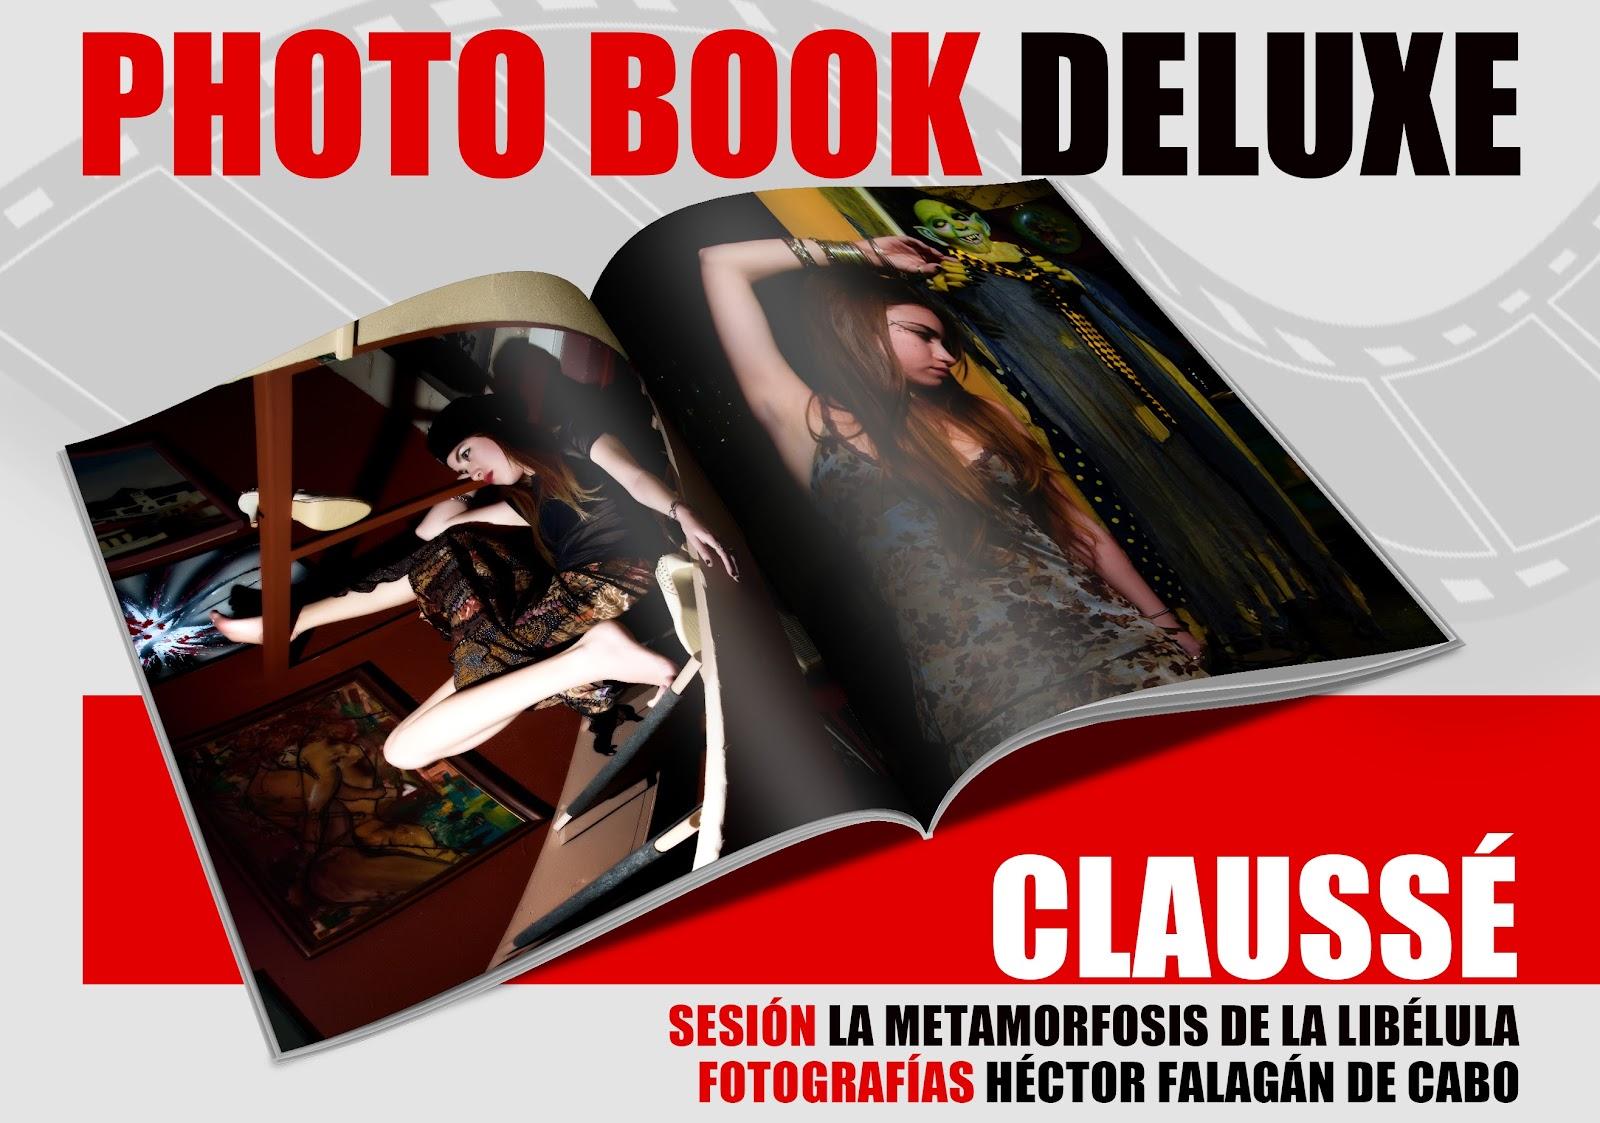 Fotografía Modelos Habana. Claussé: La metamorfosis de la Libélula. Héctor Falagán De Cabo | hfilms & photography. La Habana, Cuba.